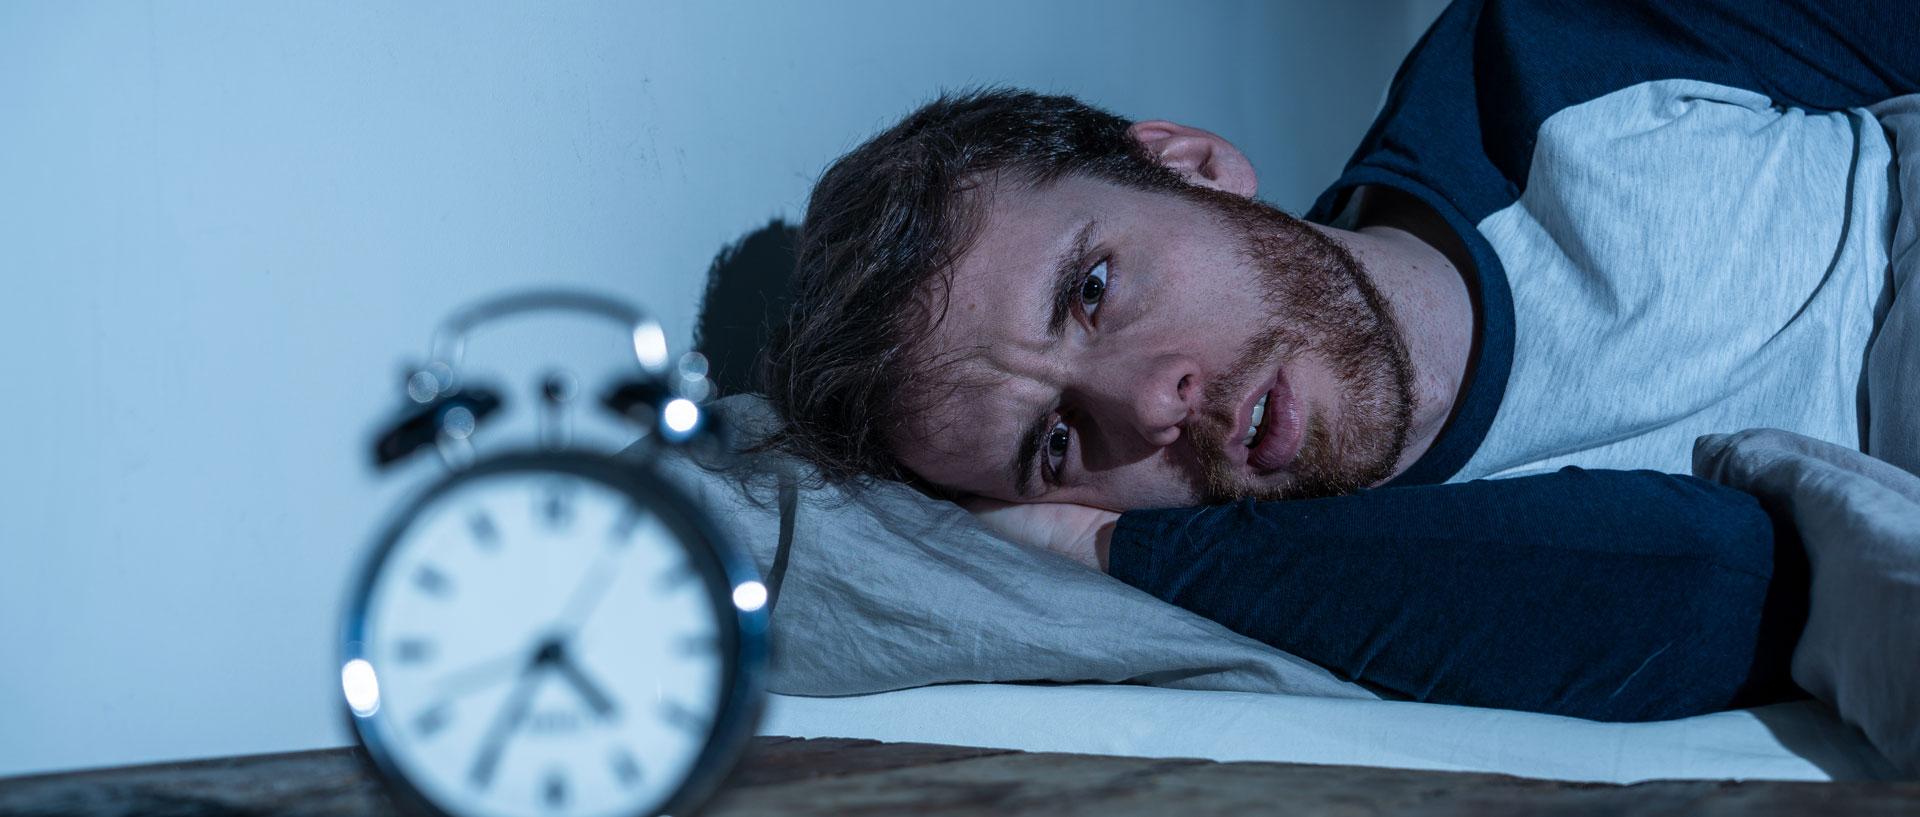 What causes sleep anxiety?